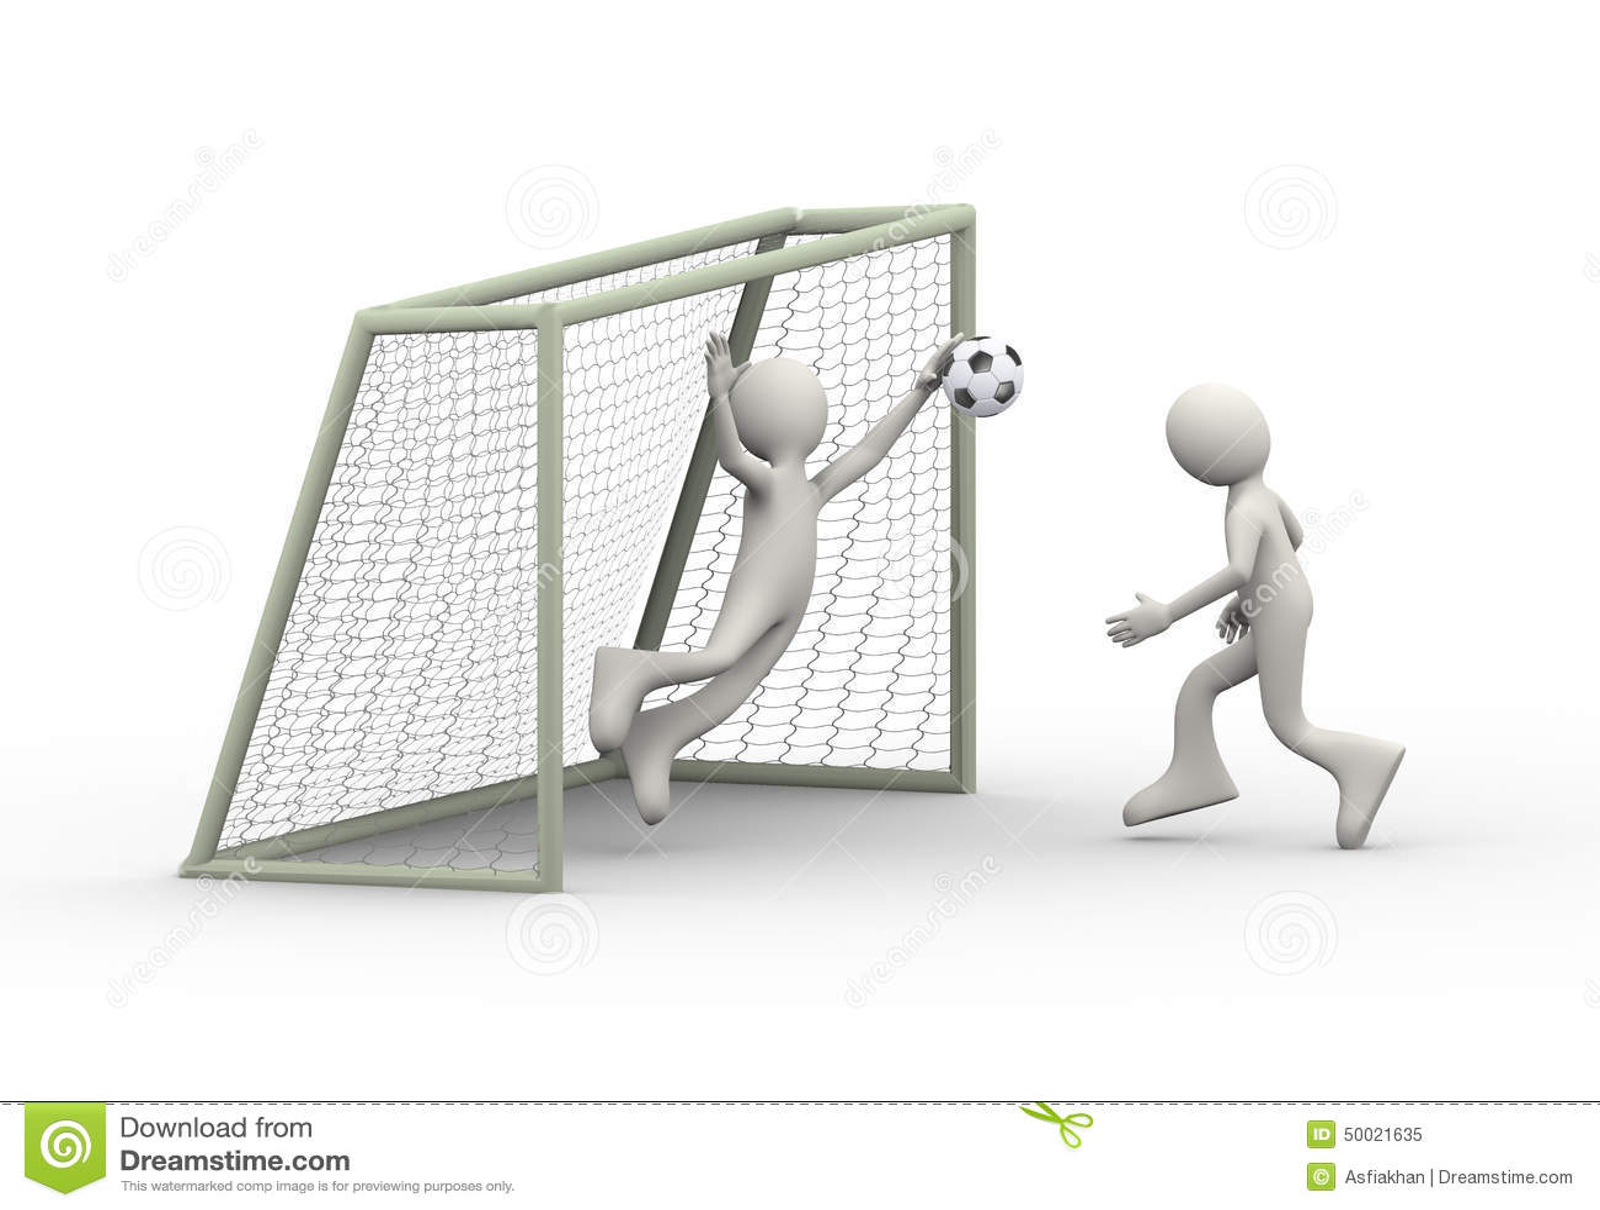 soccer player kicking ball into goal